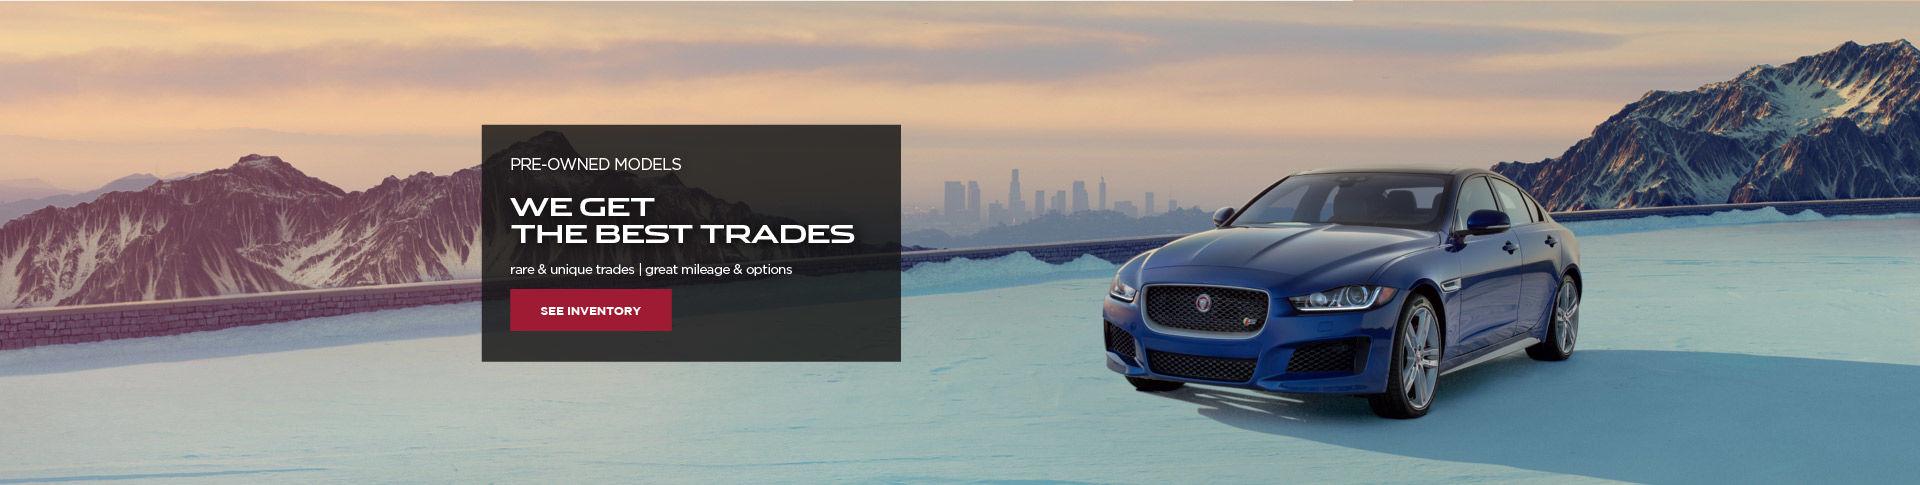 Jaguar Pre-Owned Special